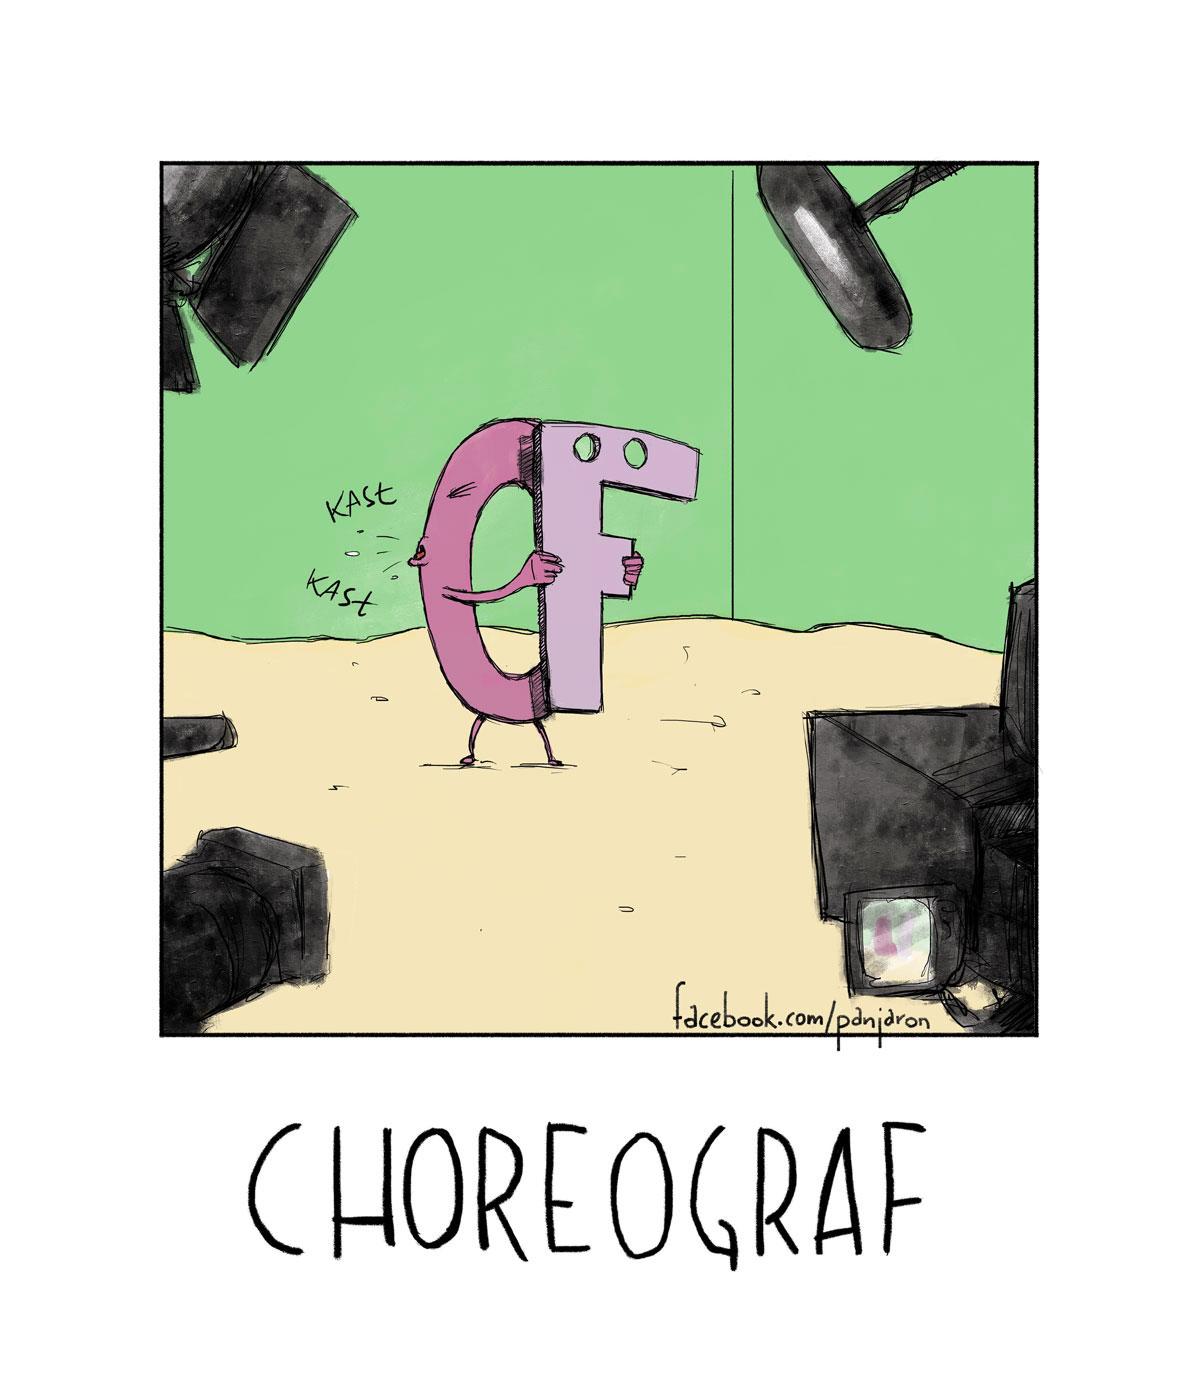 choreograf2